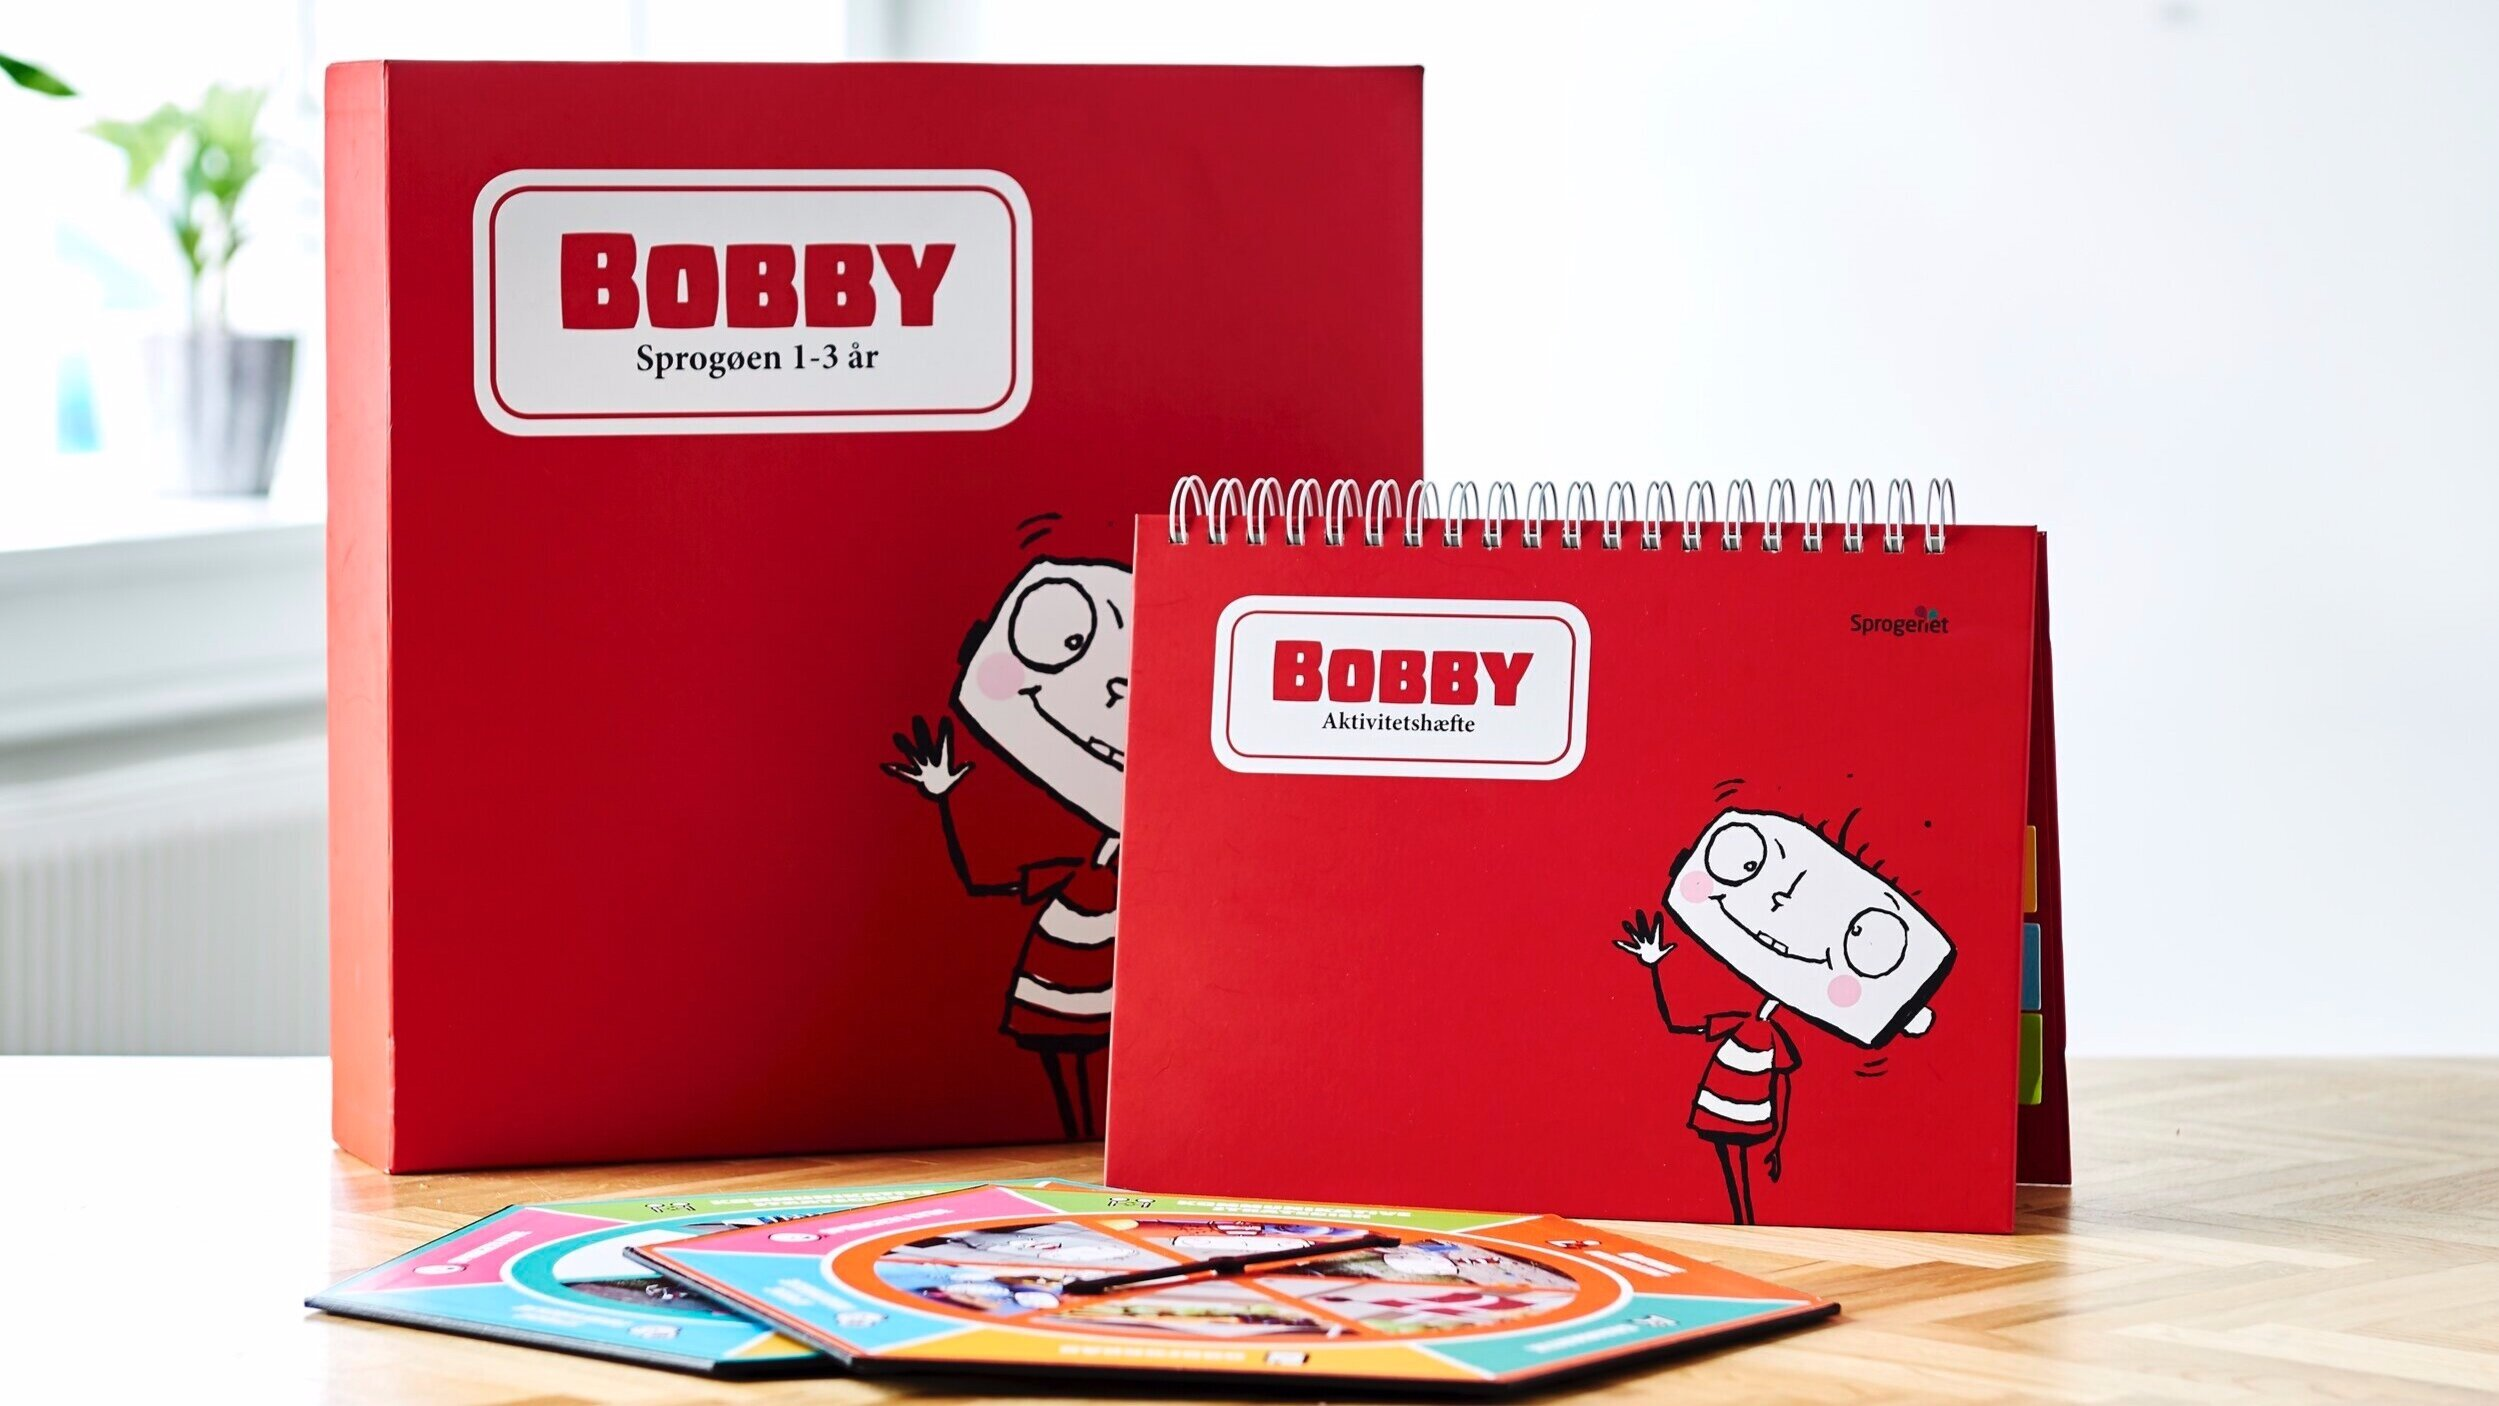 Bobbys%25C3%25A6t.jpg